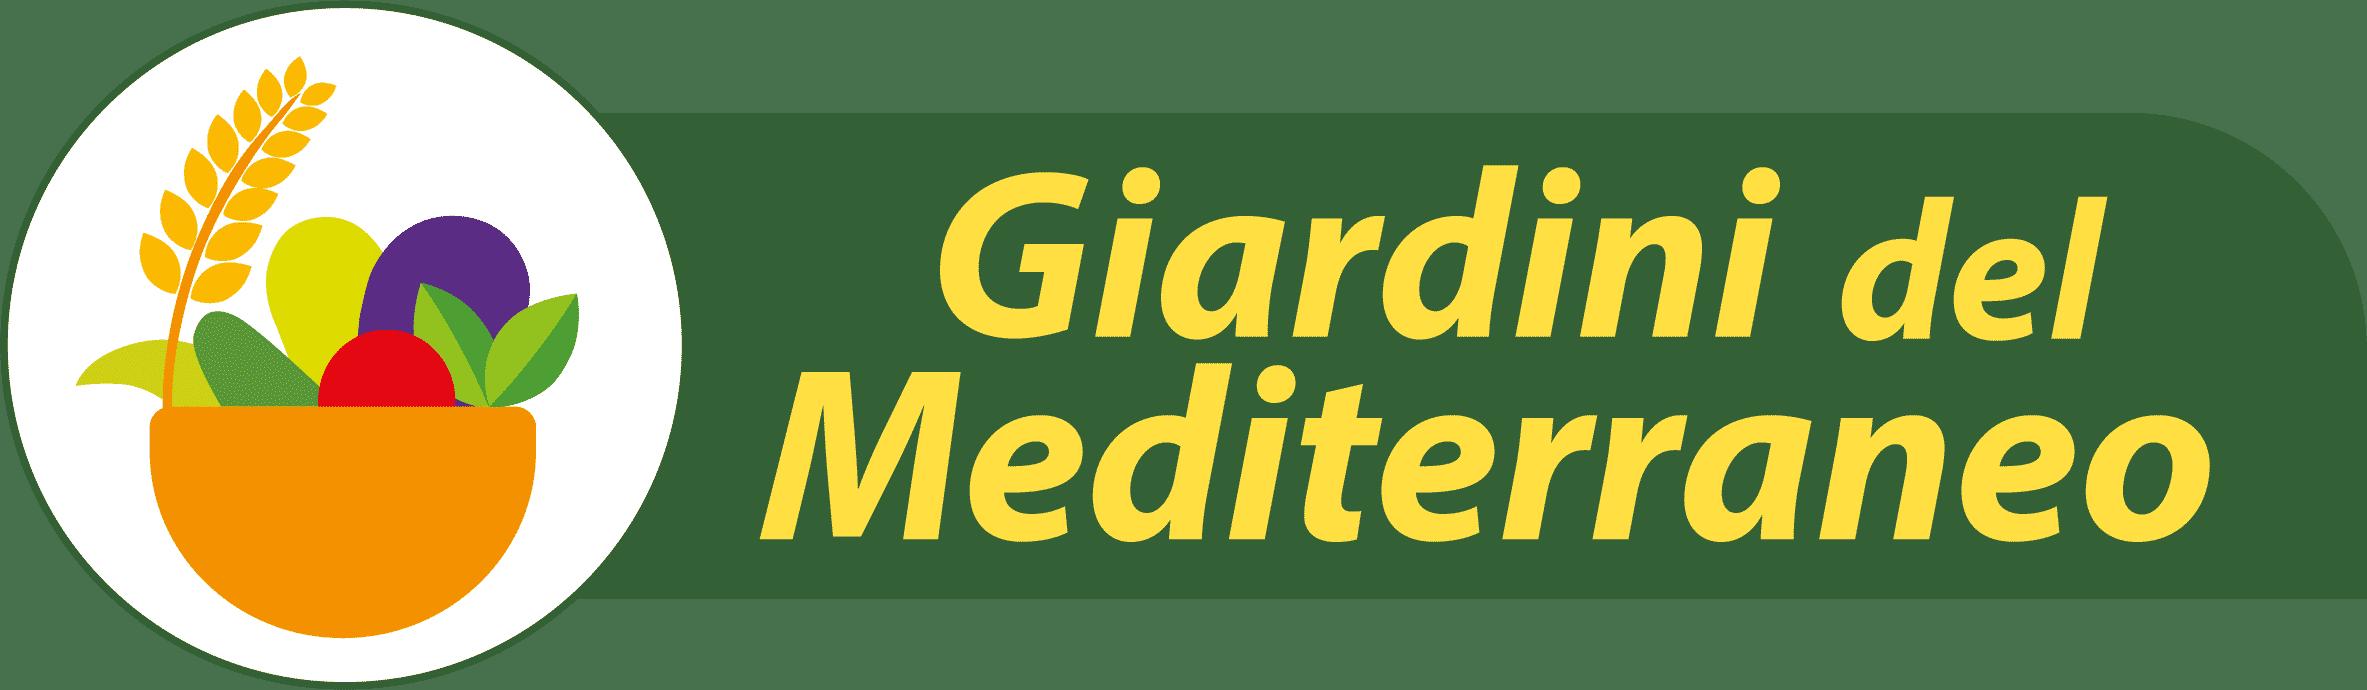 Giardini del Mediterraneo Srl (Mediterranean Gardens)